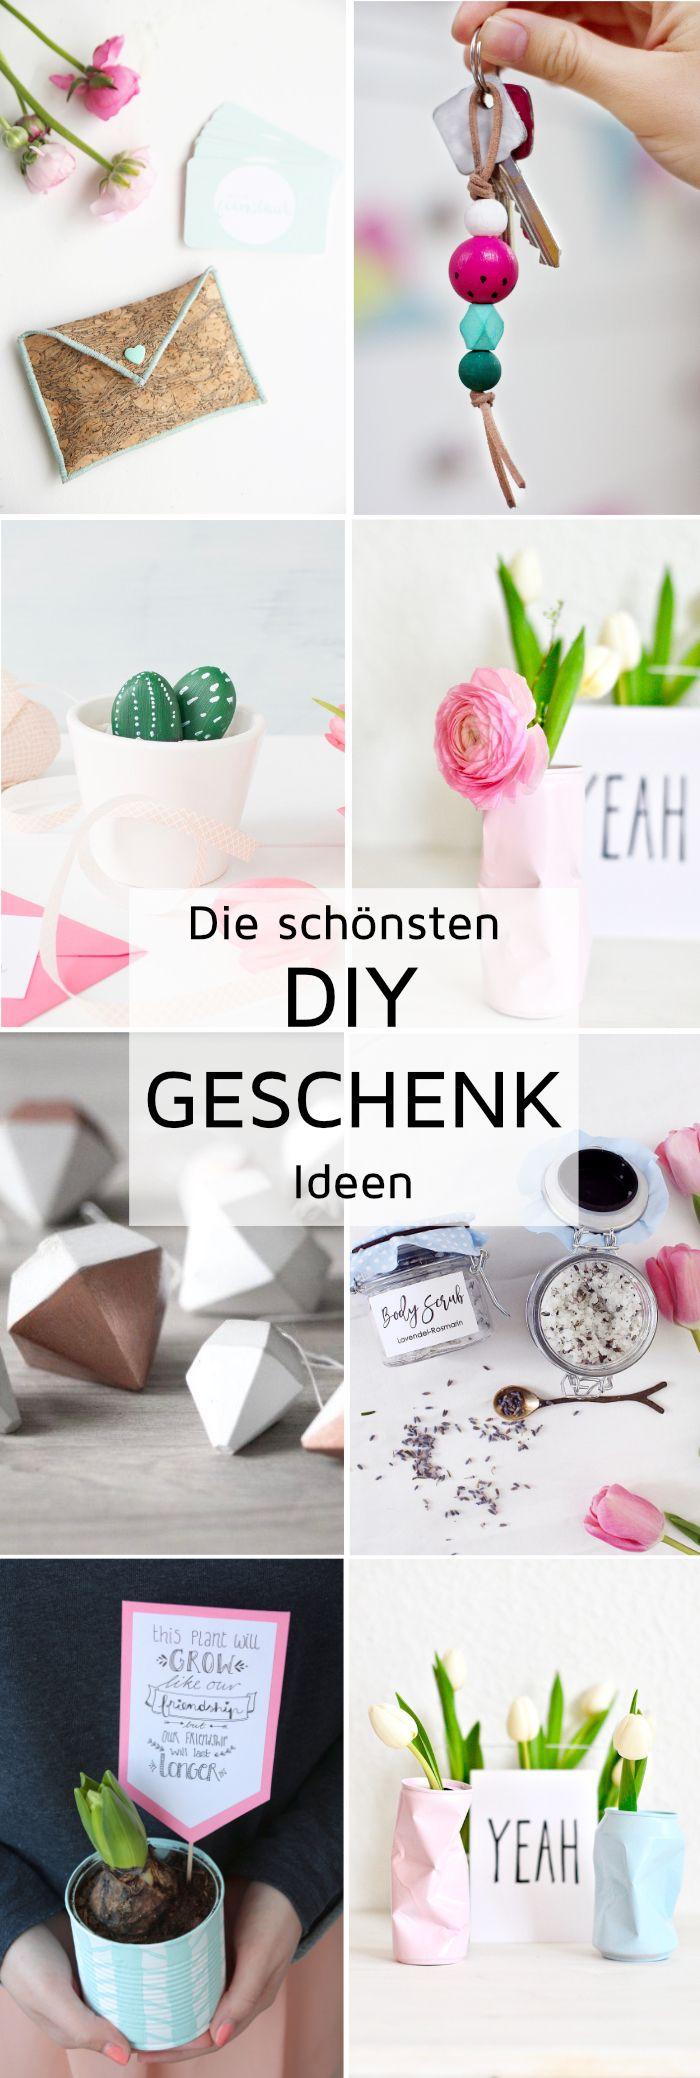 DIY Geschenke - Kreative Geschenkideen zum Selbermachen